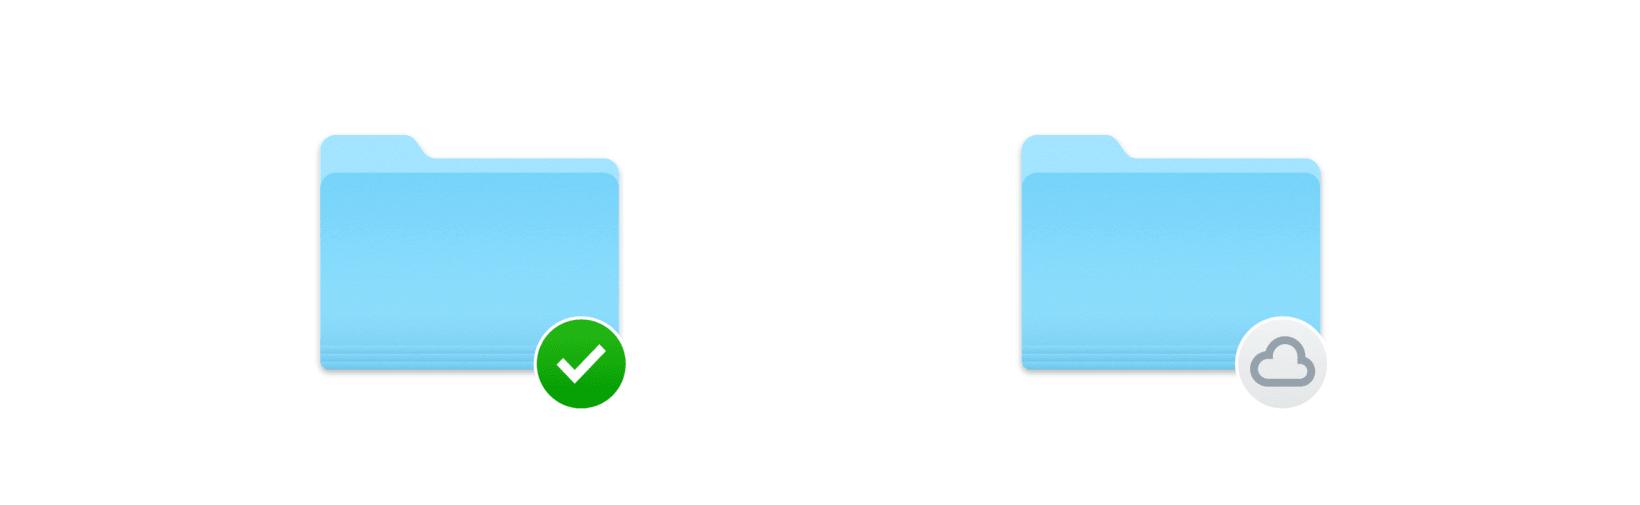 infinite-folders